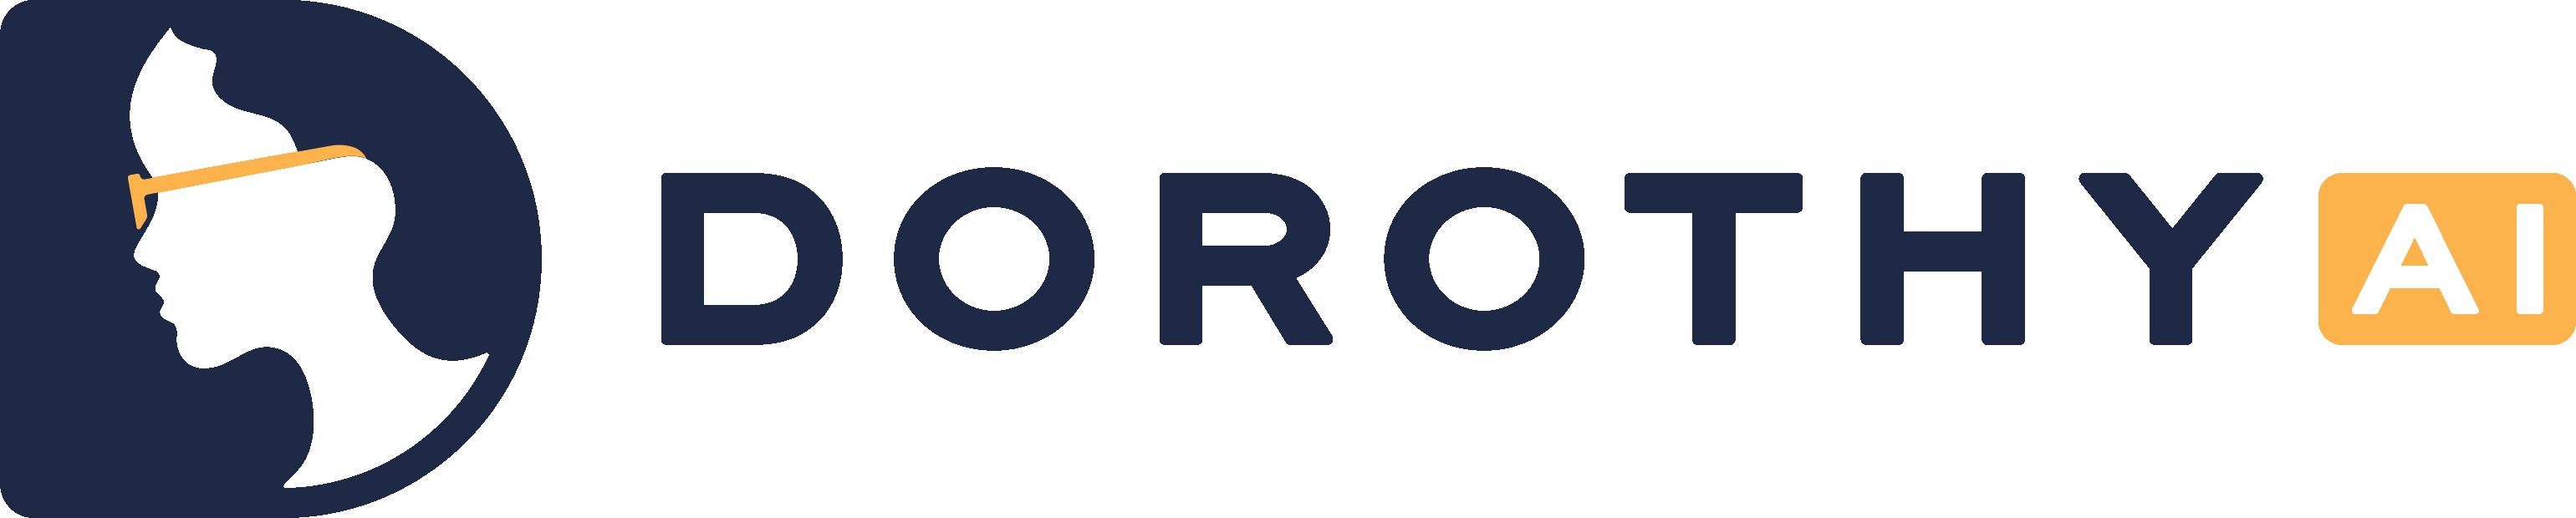 dorothy-ai-horizontal.png